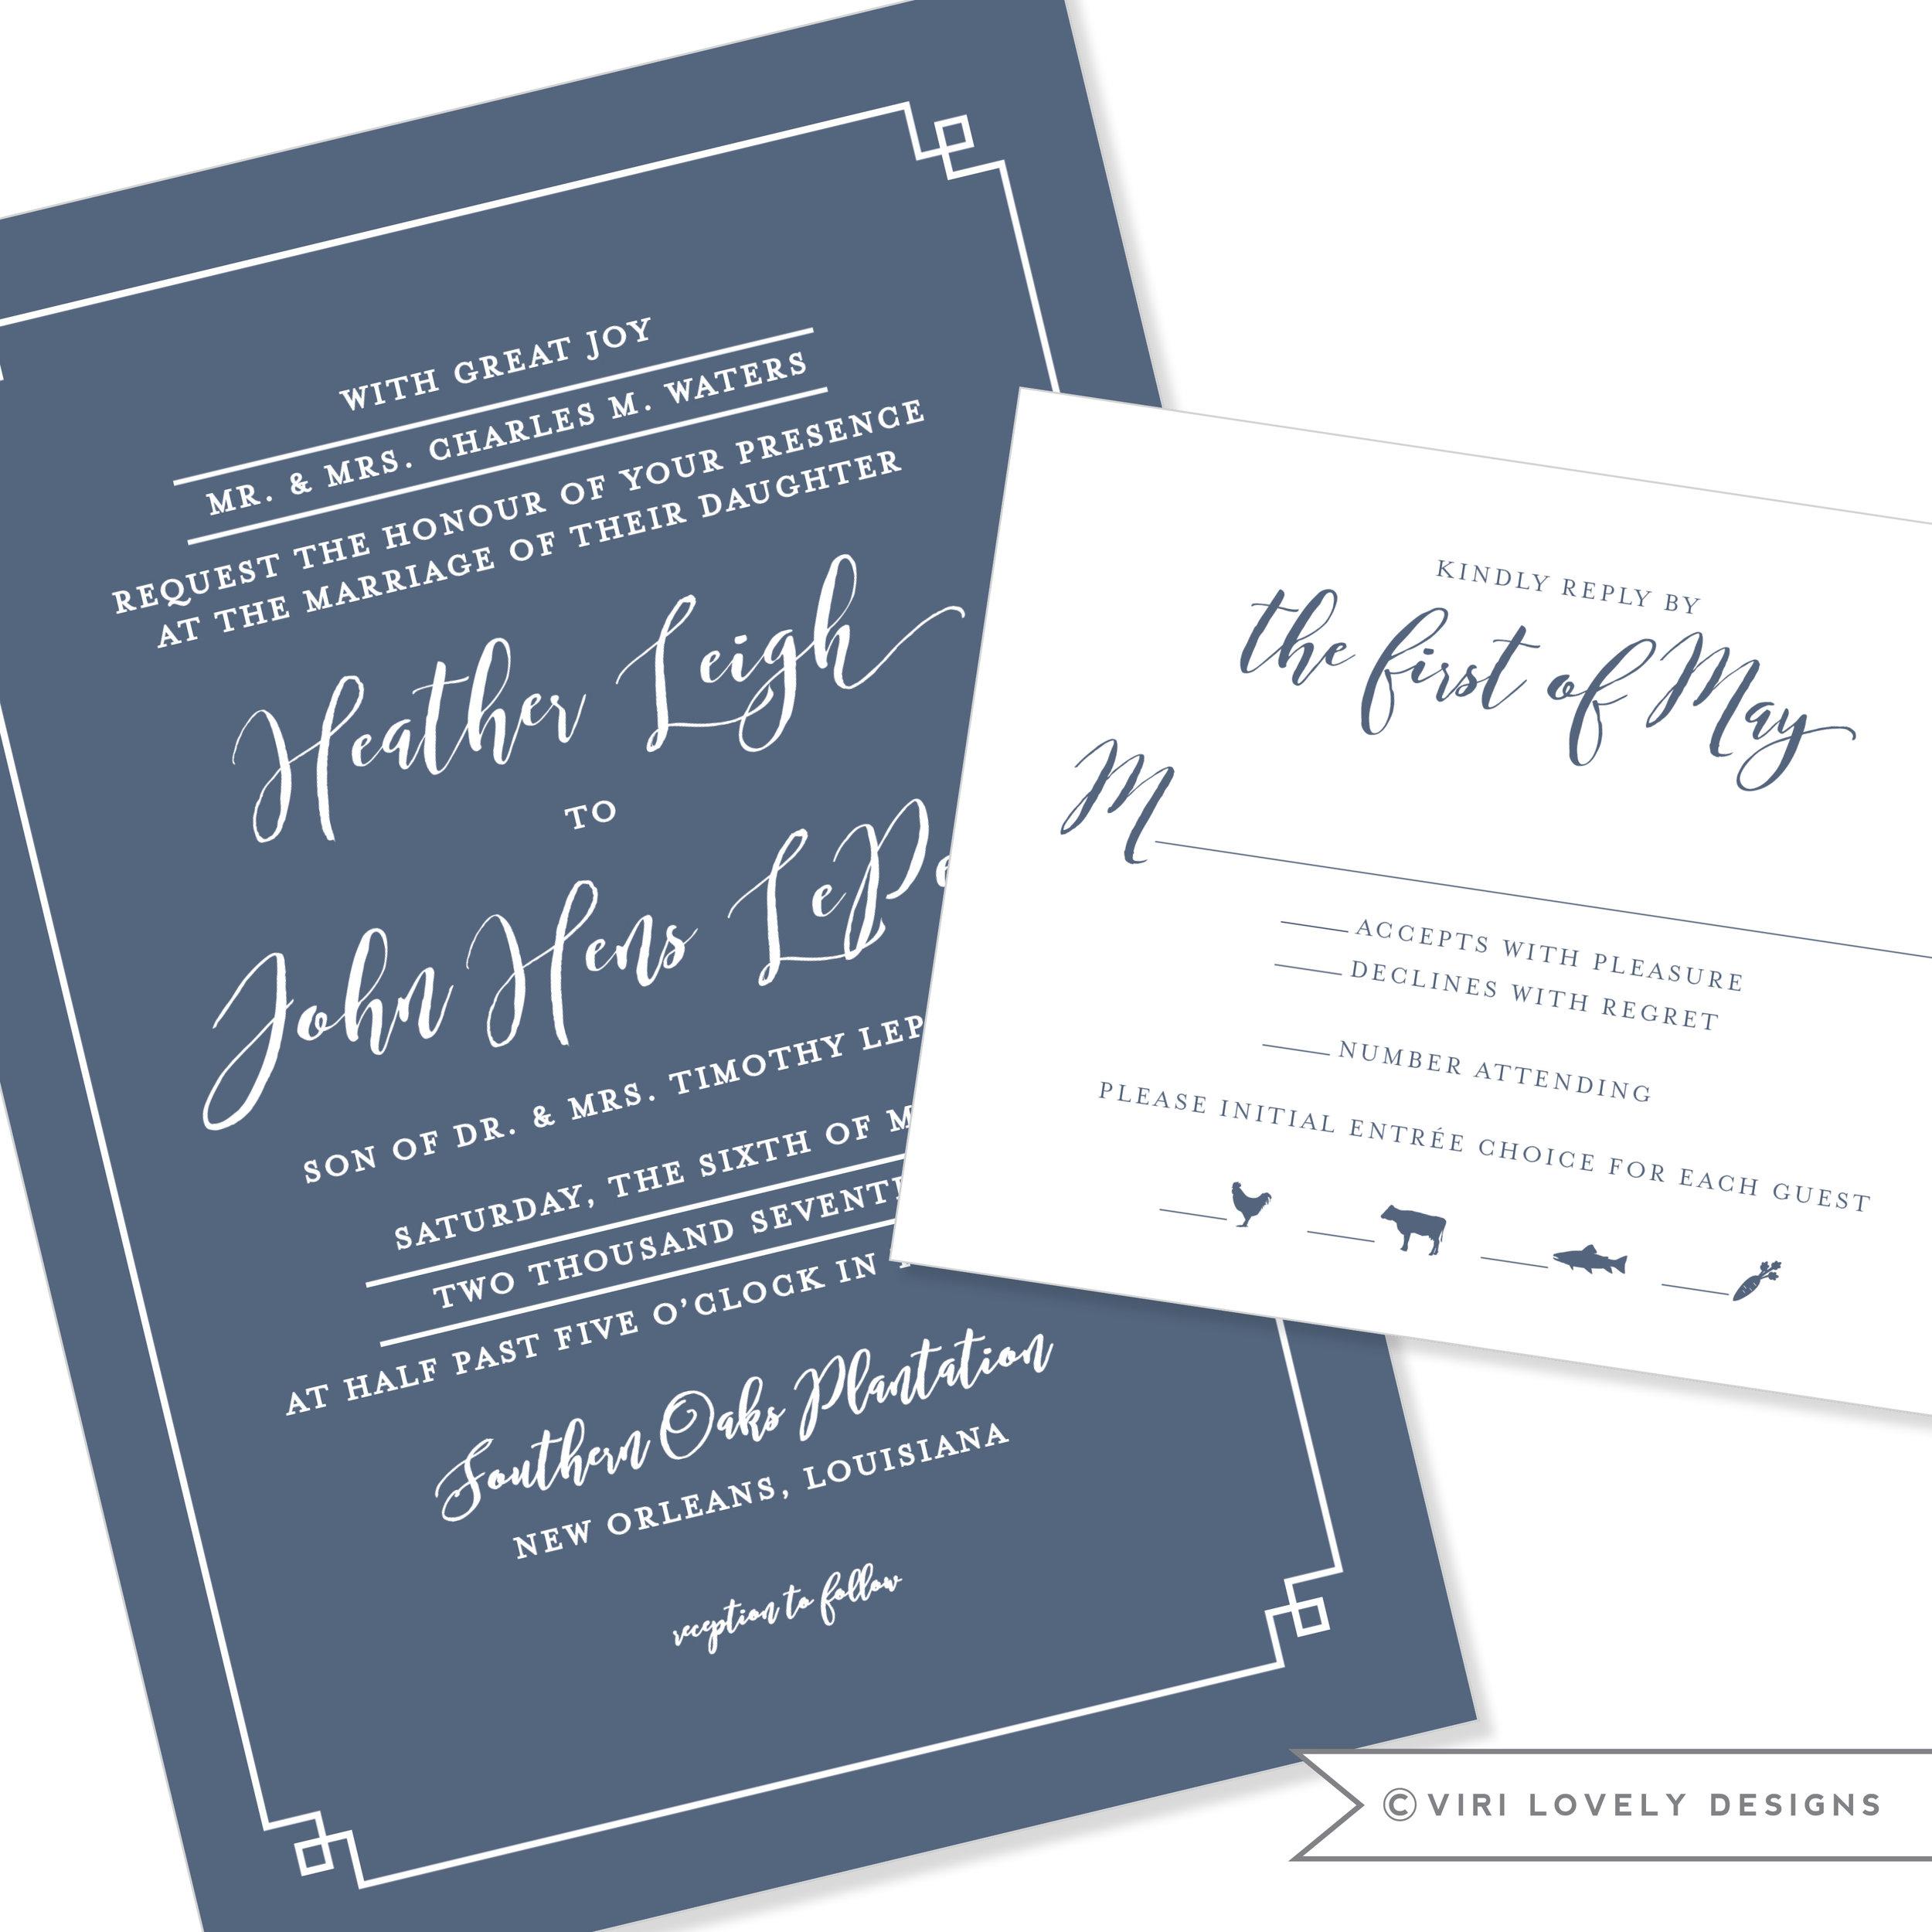 Attractive Romantic Modern Wedding Invitation #1170